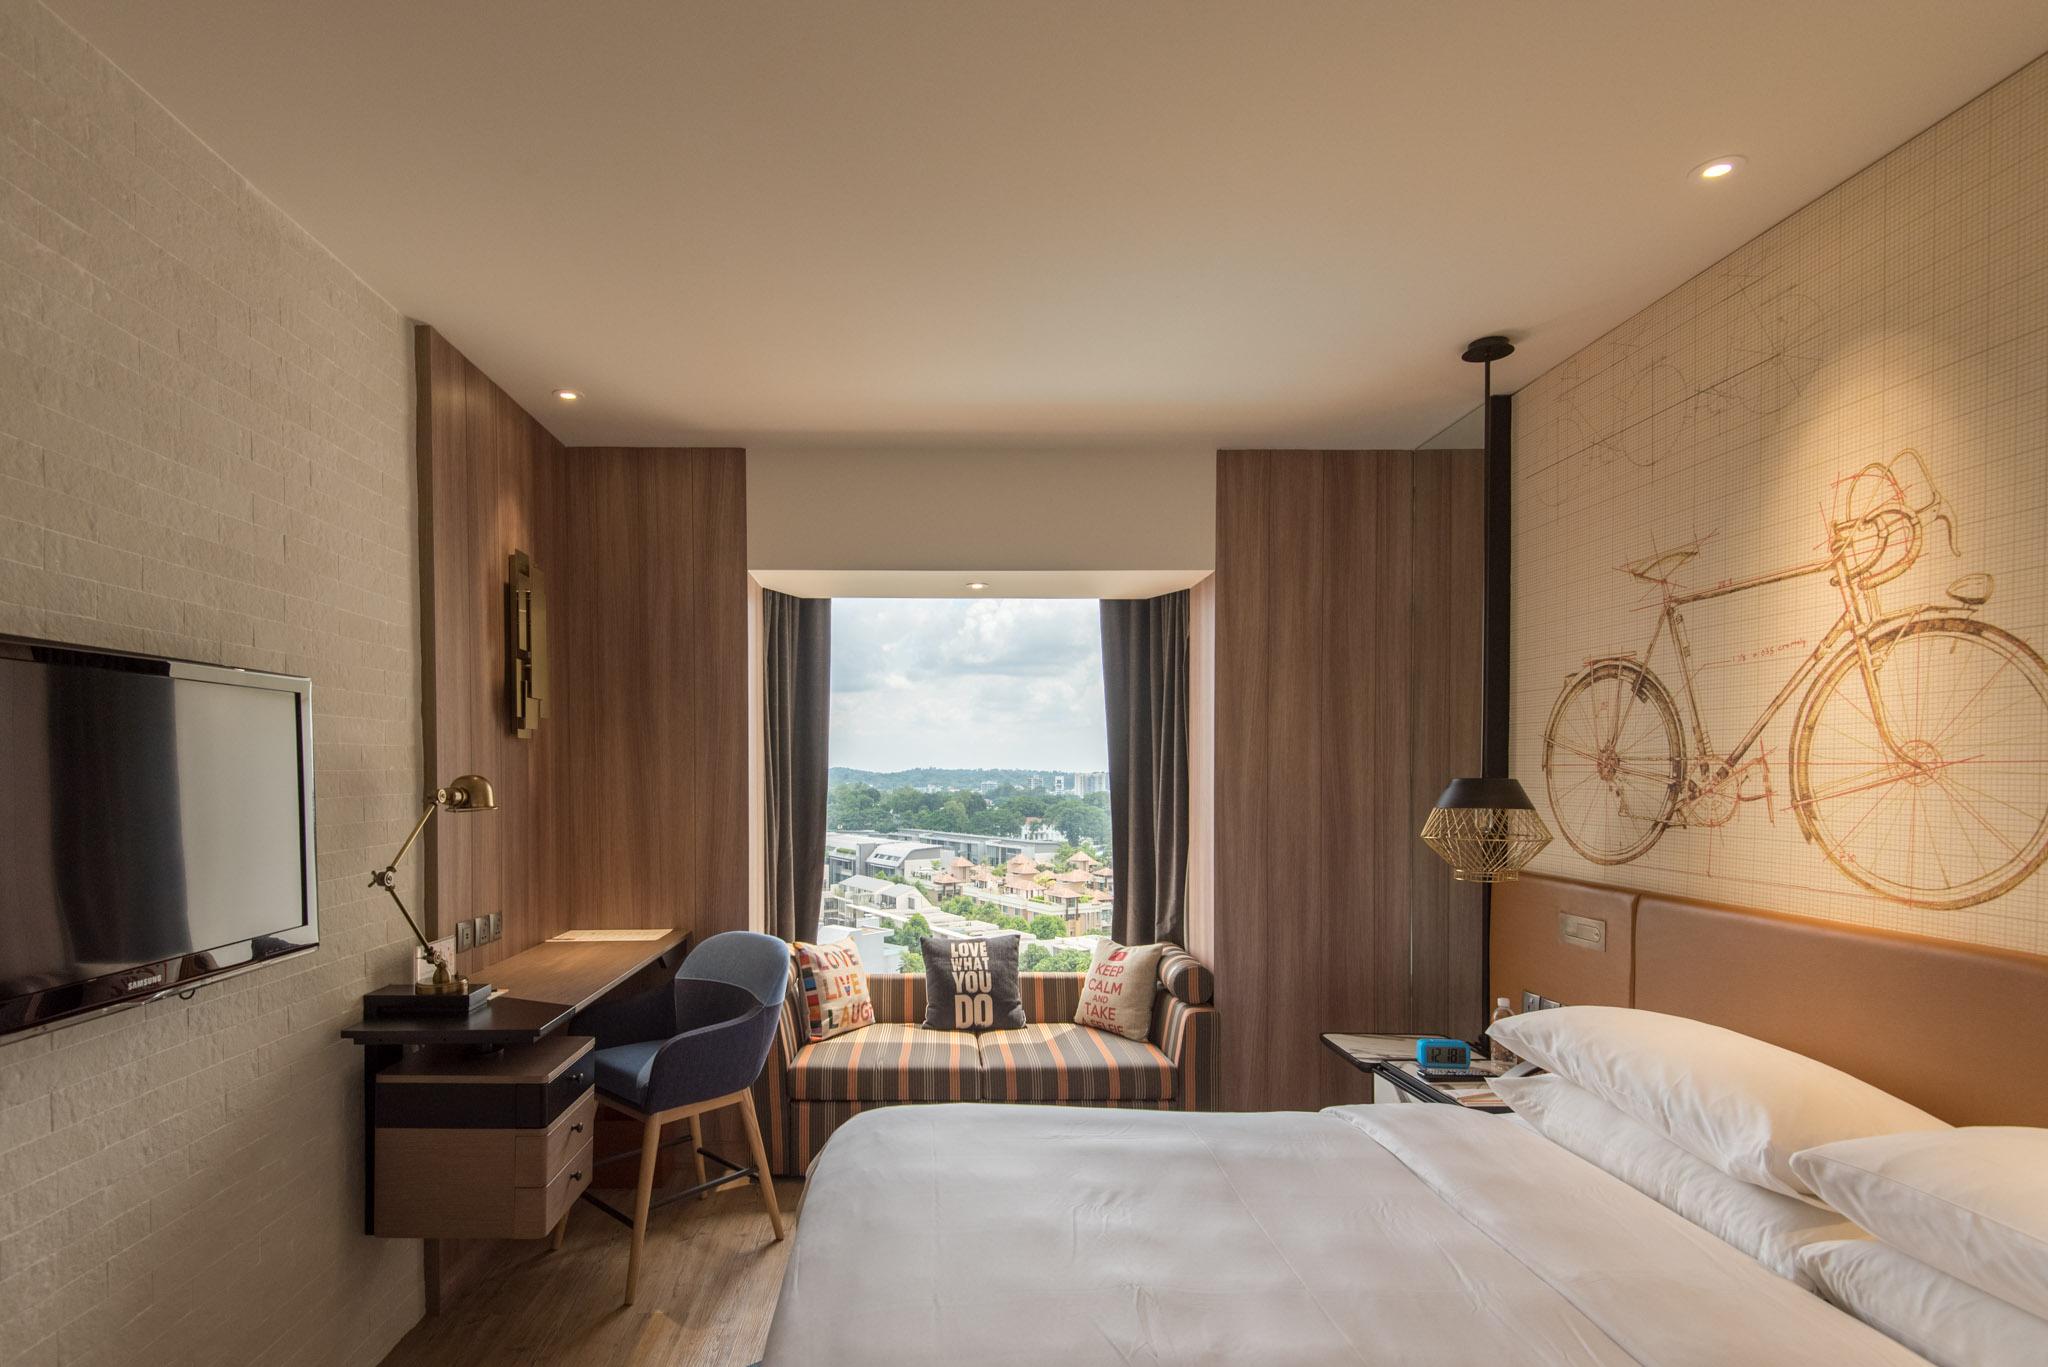 RefurbishedClub Rooms (Hotel Jen Tanglin)